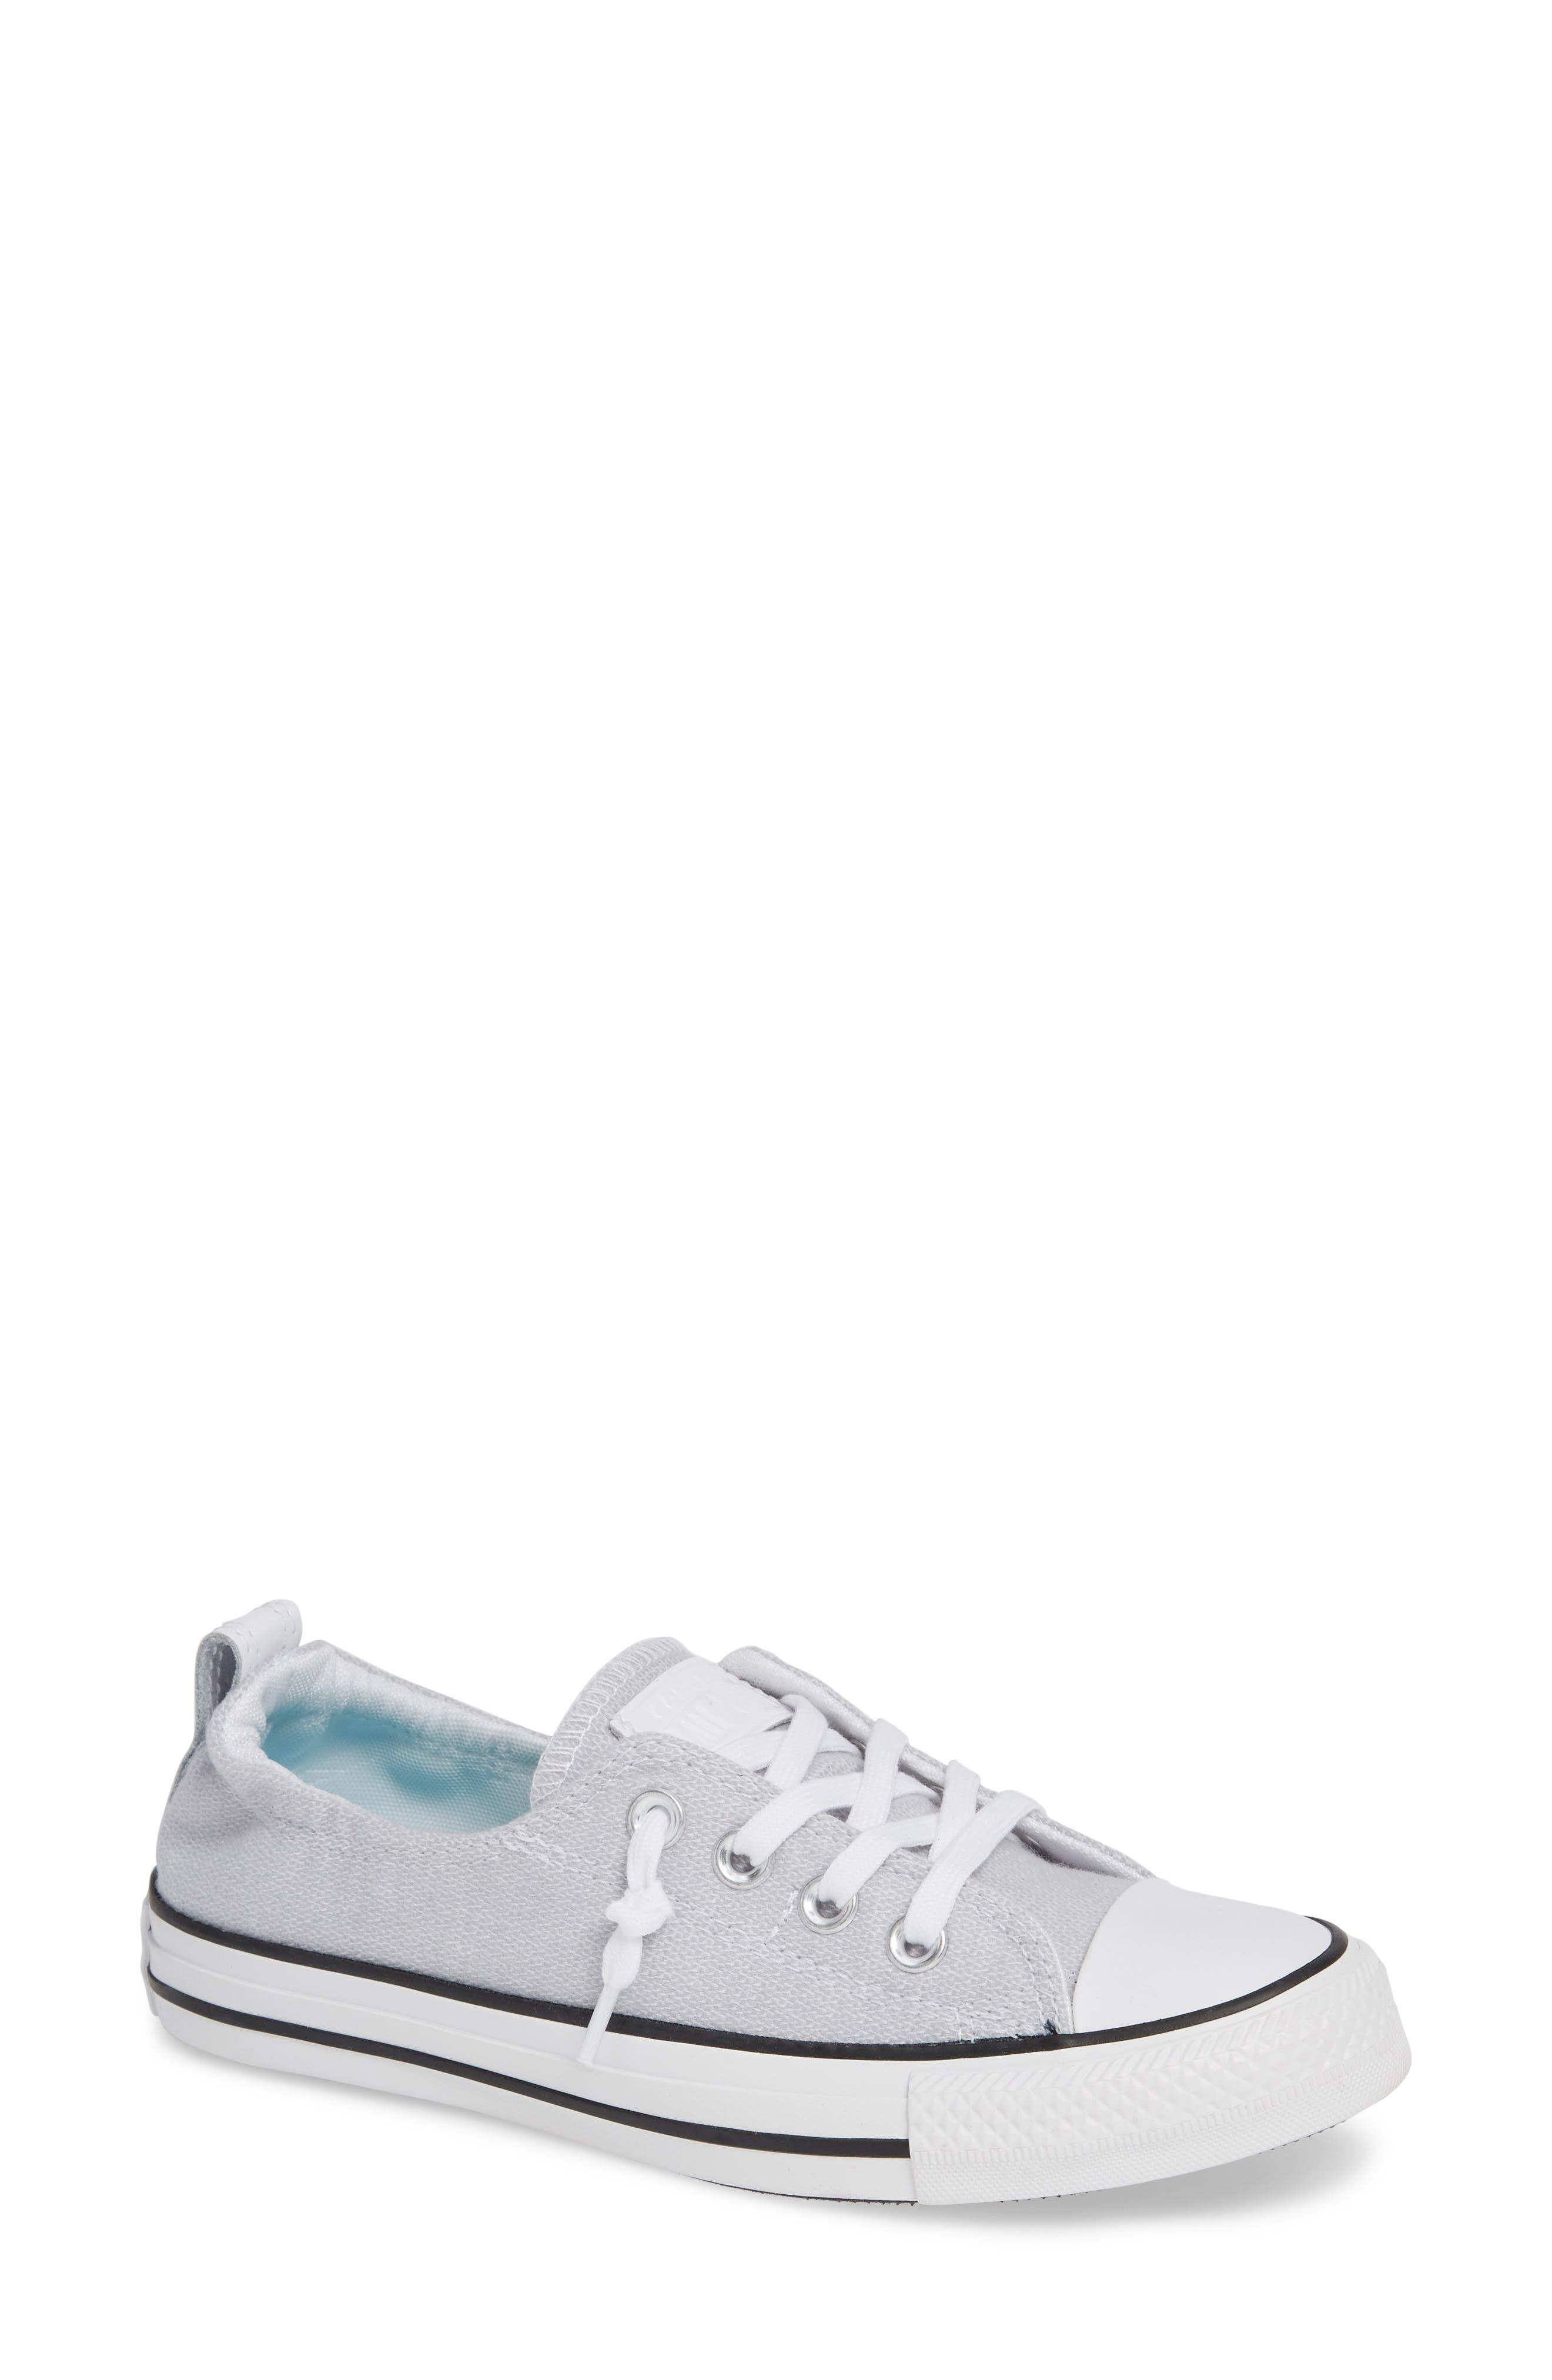 CONVERSE Chuck Taylor<sup>®</sup> 'Shoreline' Sneaker, Main, color, WHITE